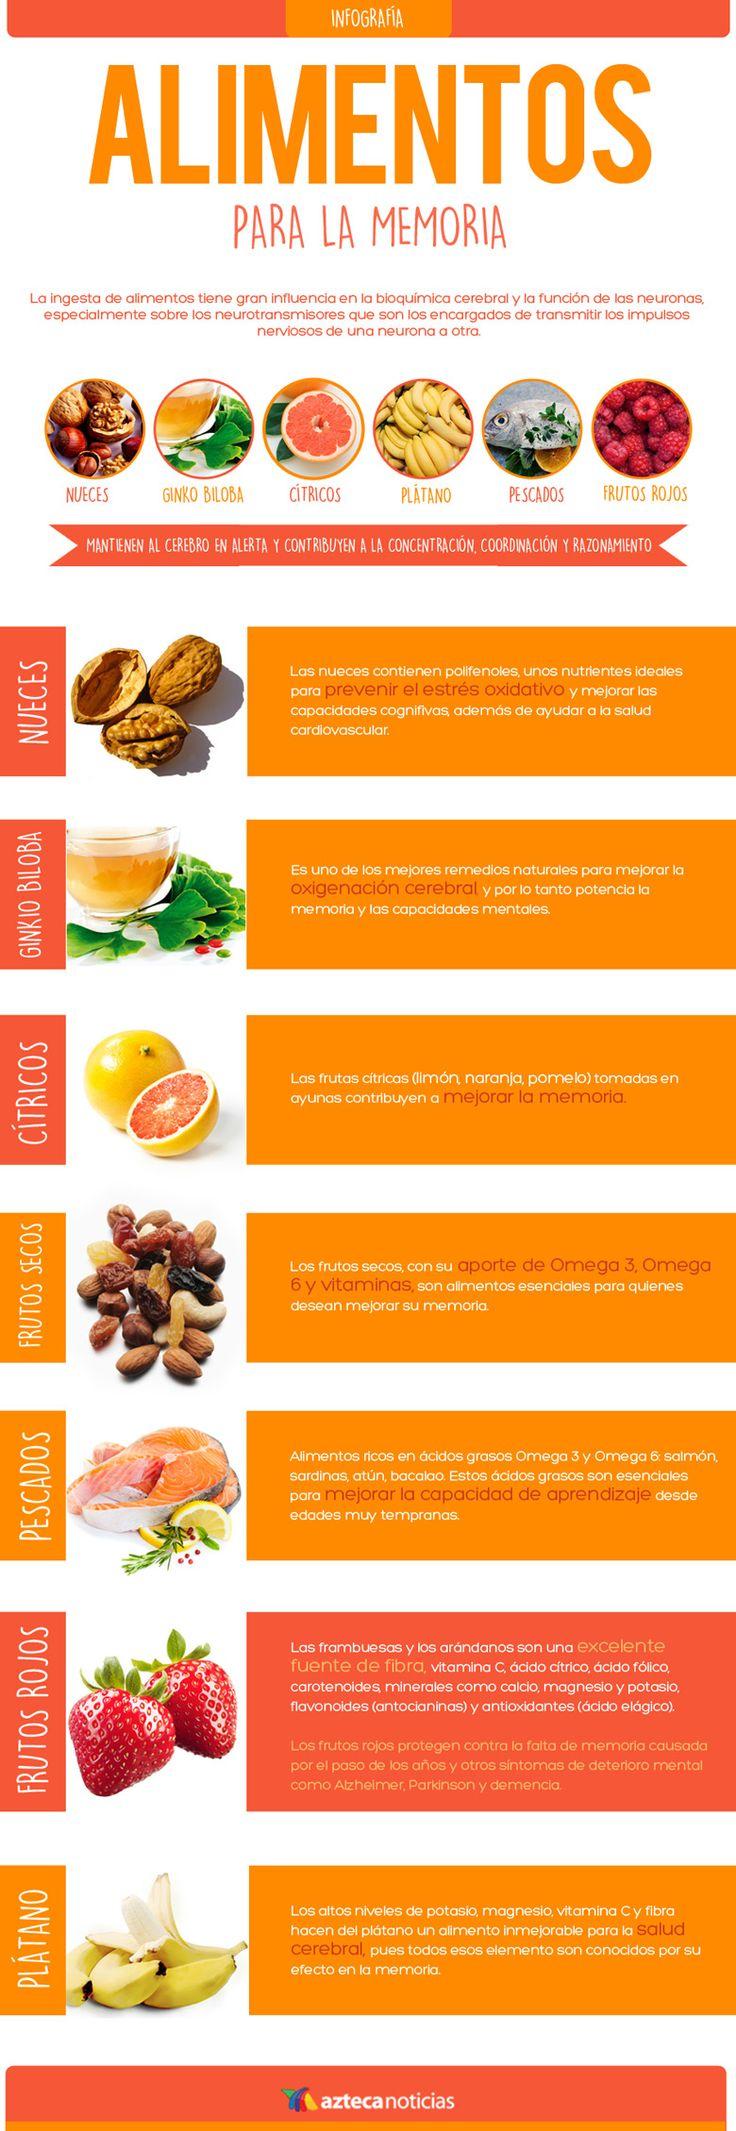 Alimentos para la memoria #infografia